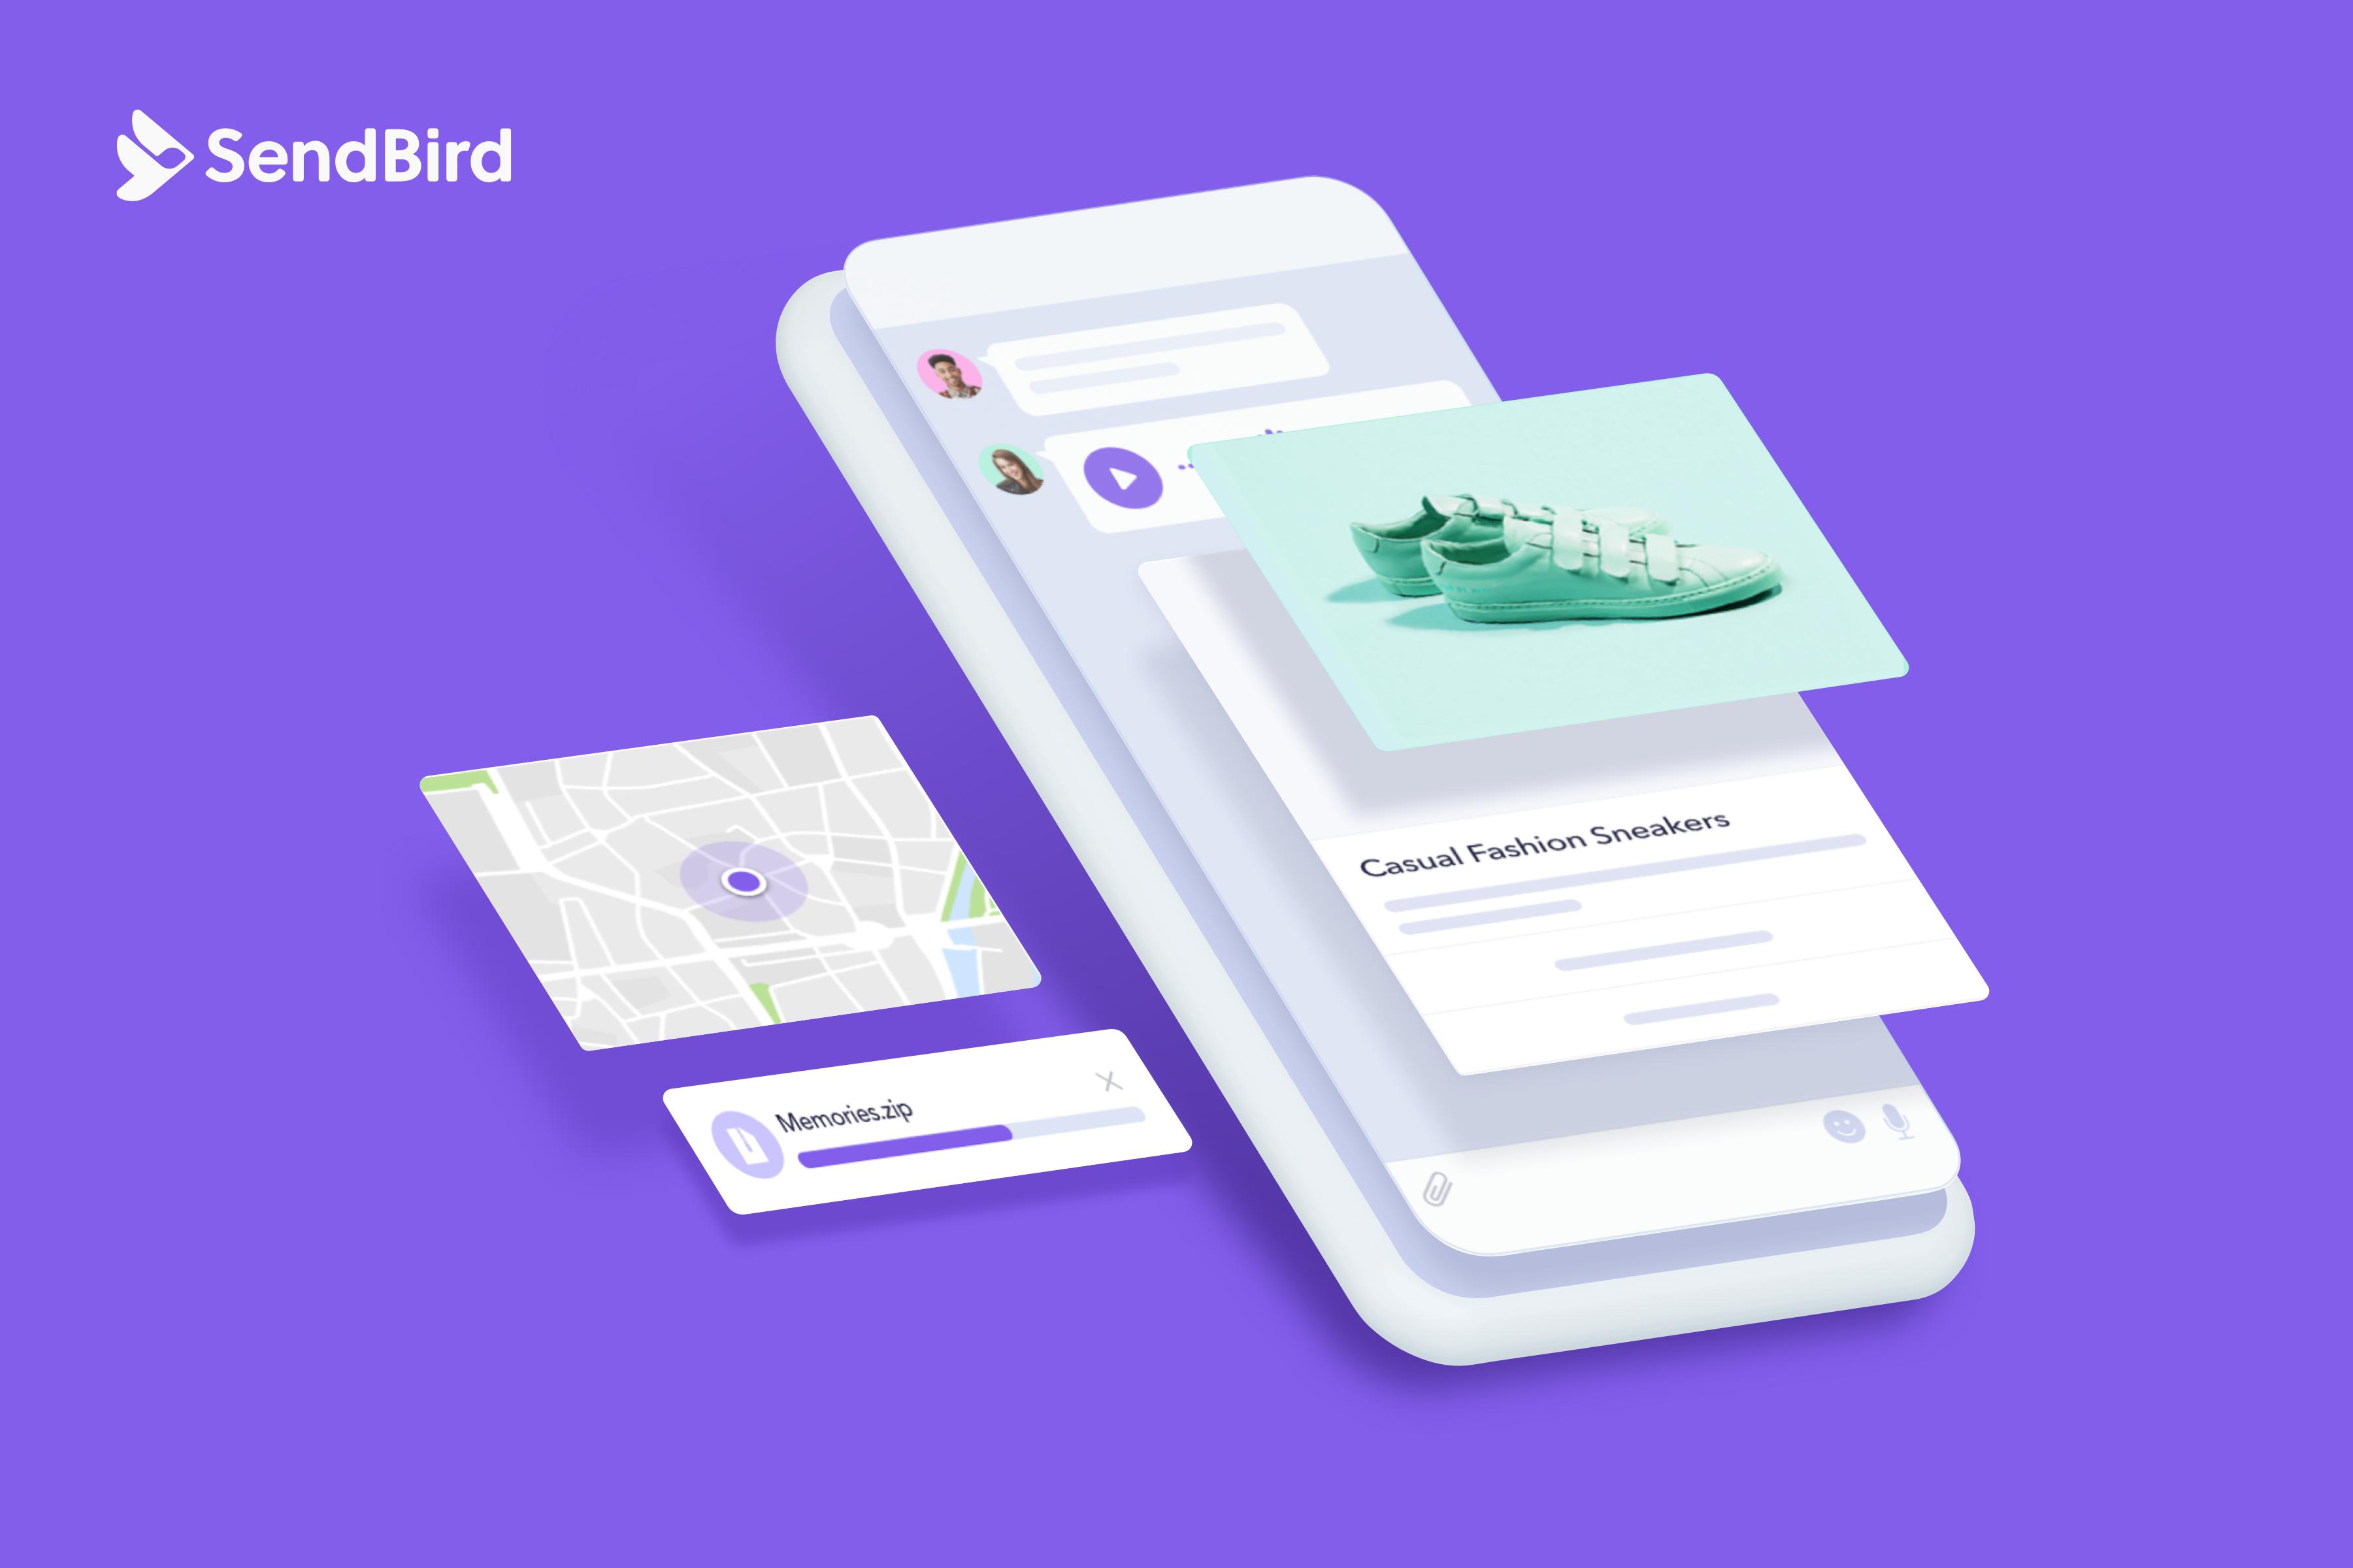 SendBird Chat Platform Raises $52 Million